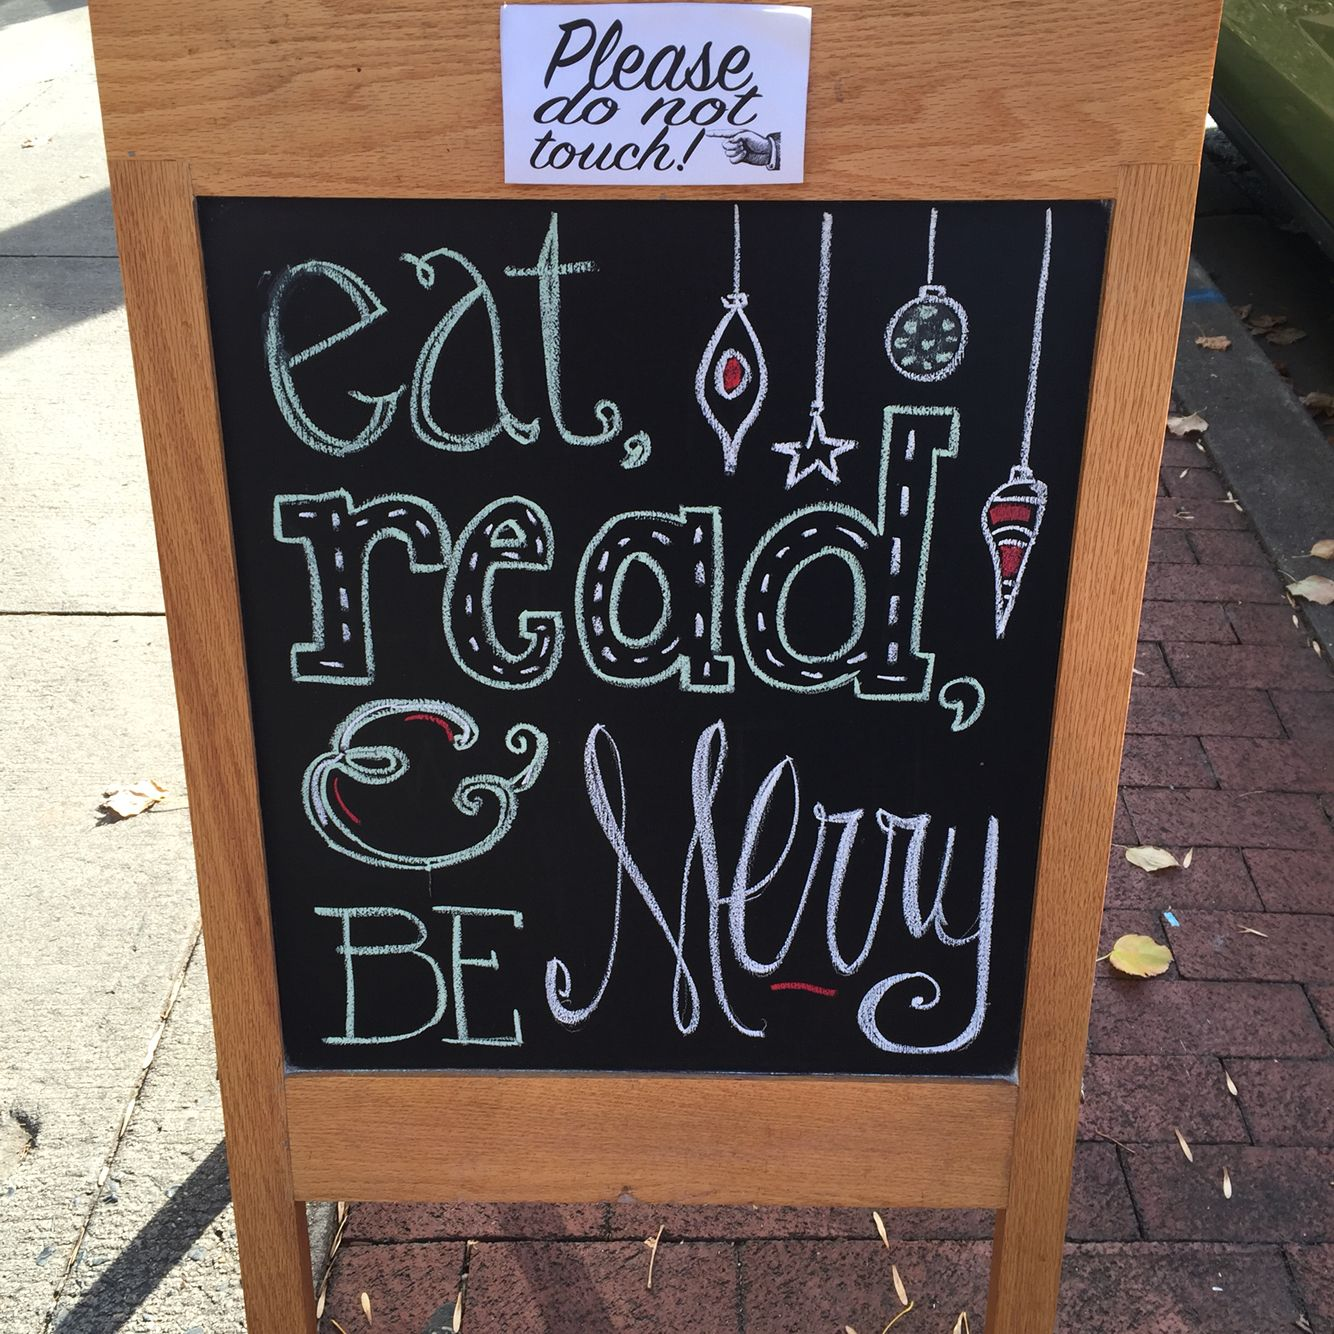 Bookstore chalkboard | Bookstore Chalkboards and Window ...